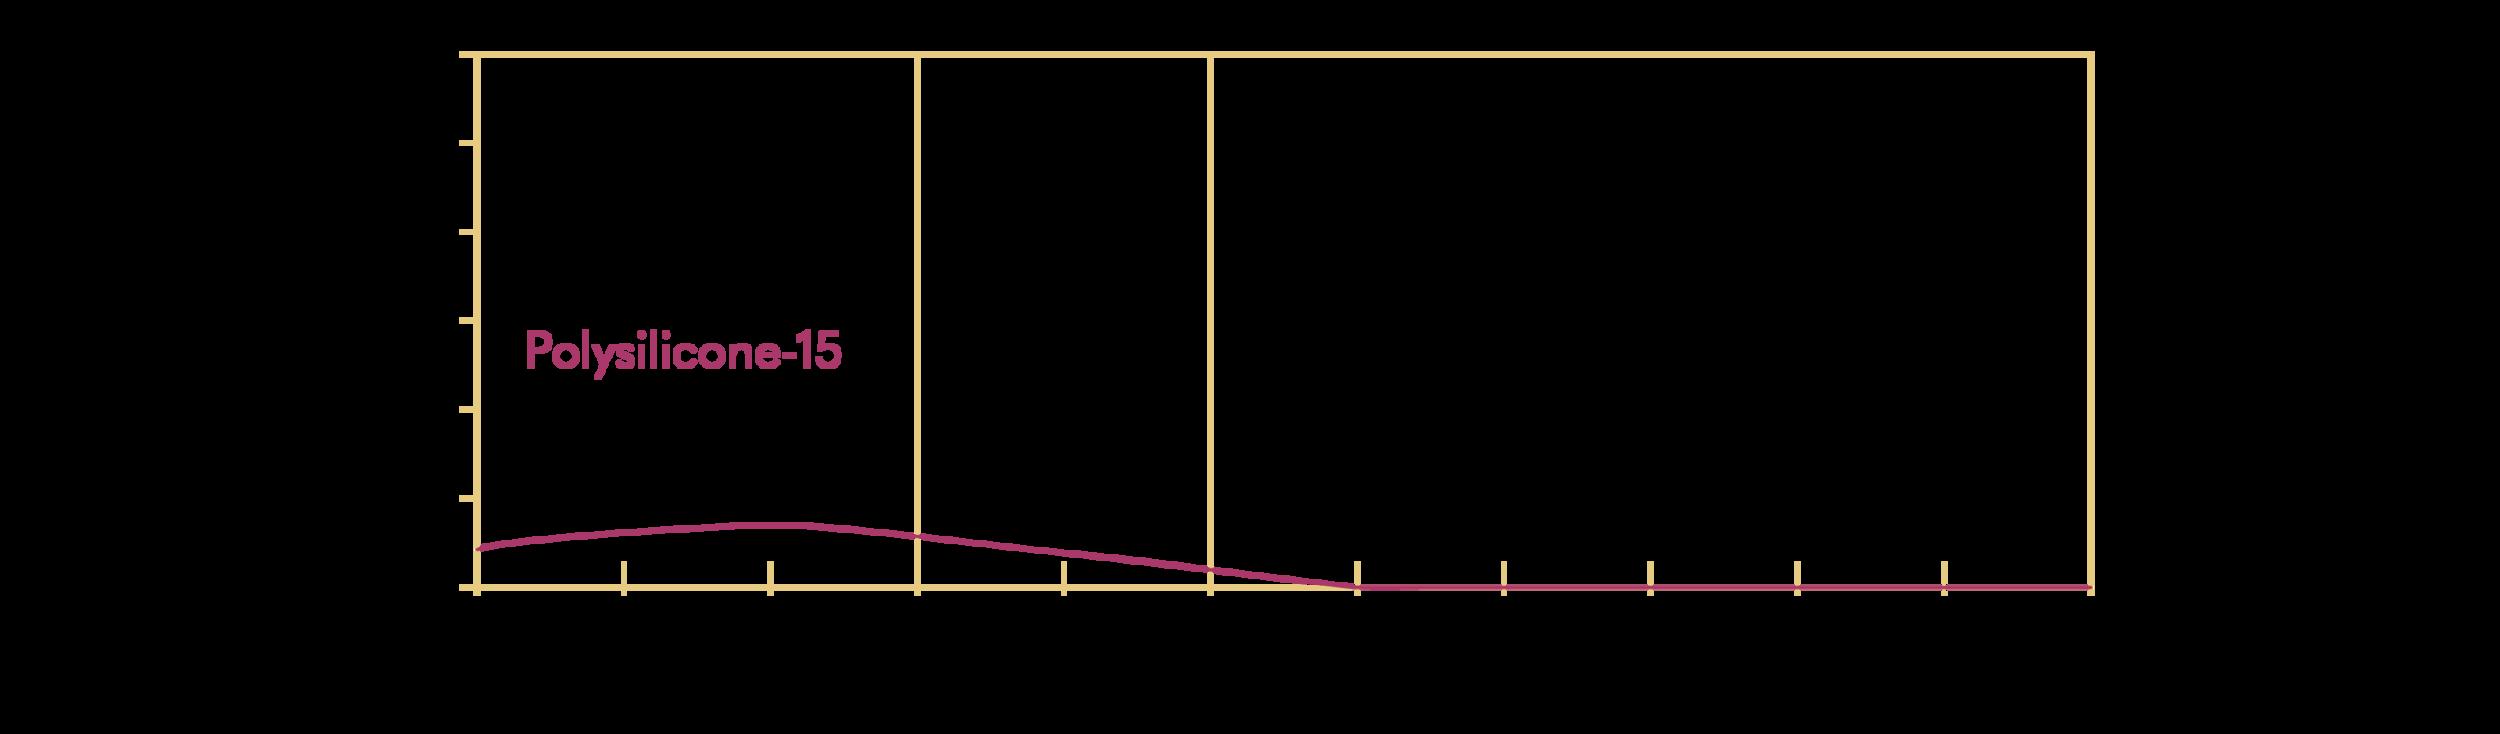 Polysilicone-15; Parsol SLX (DSM)